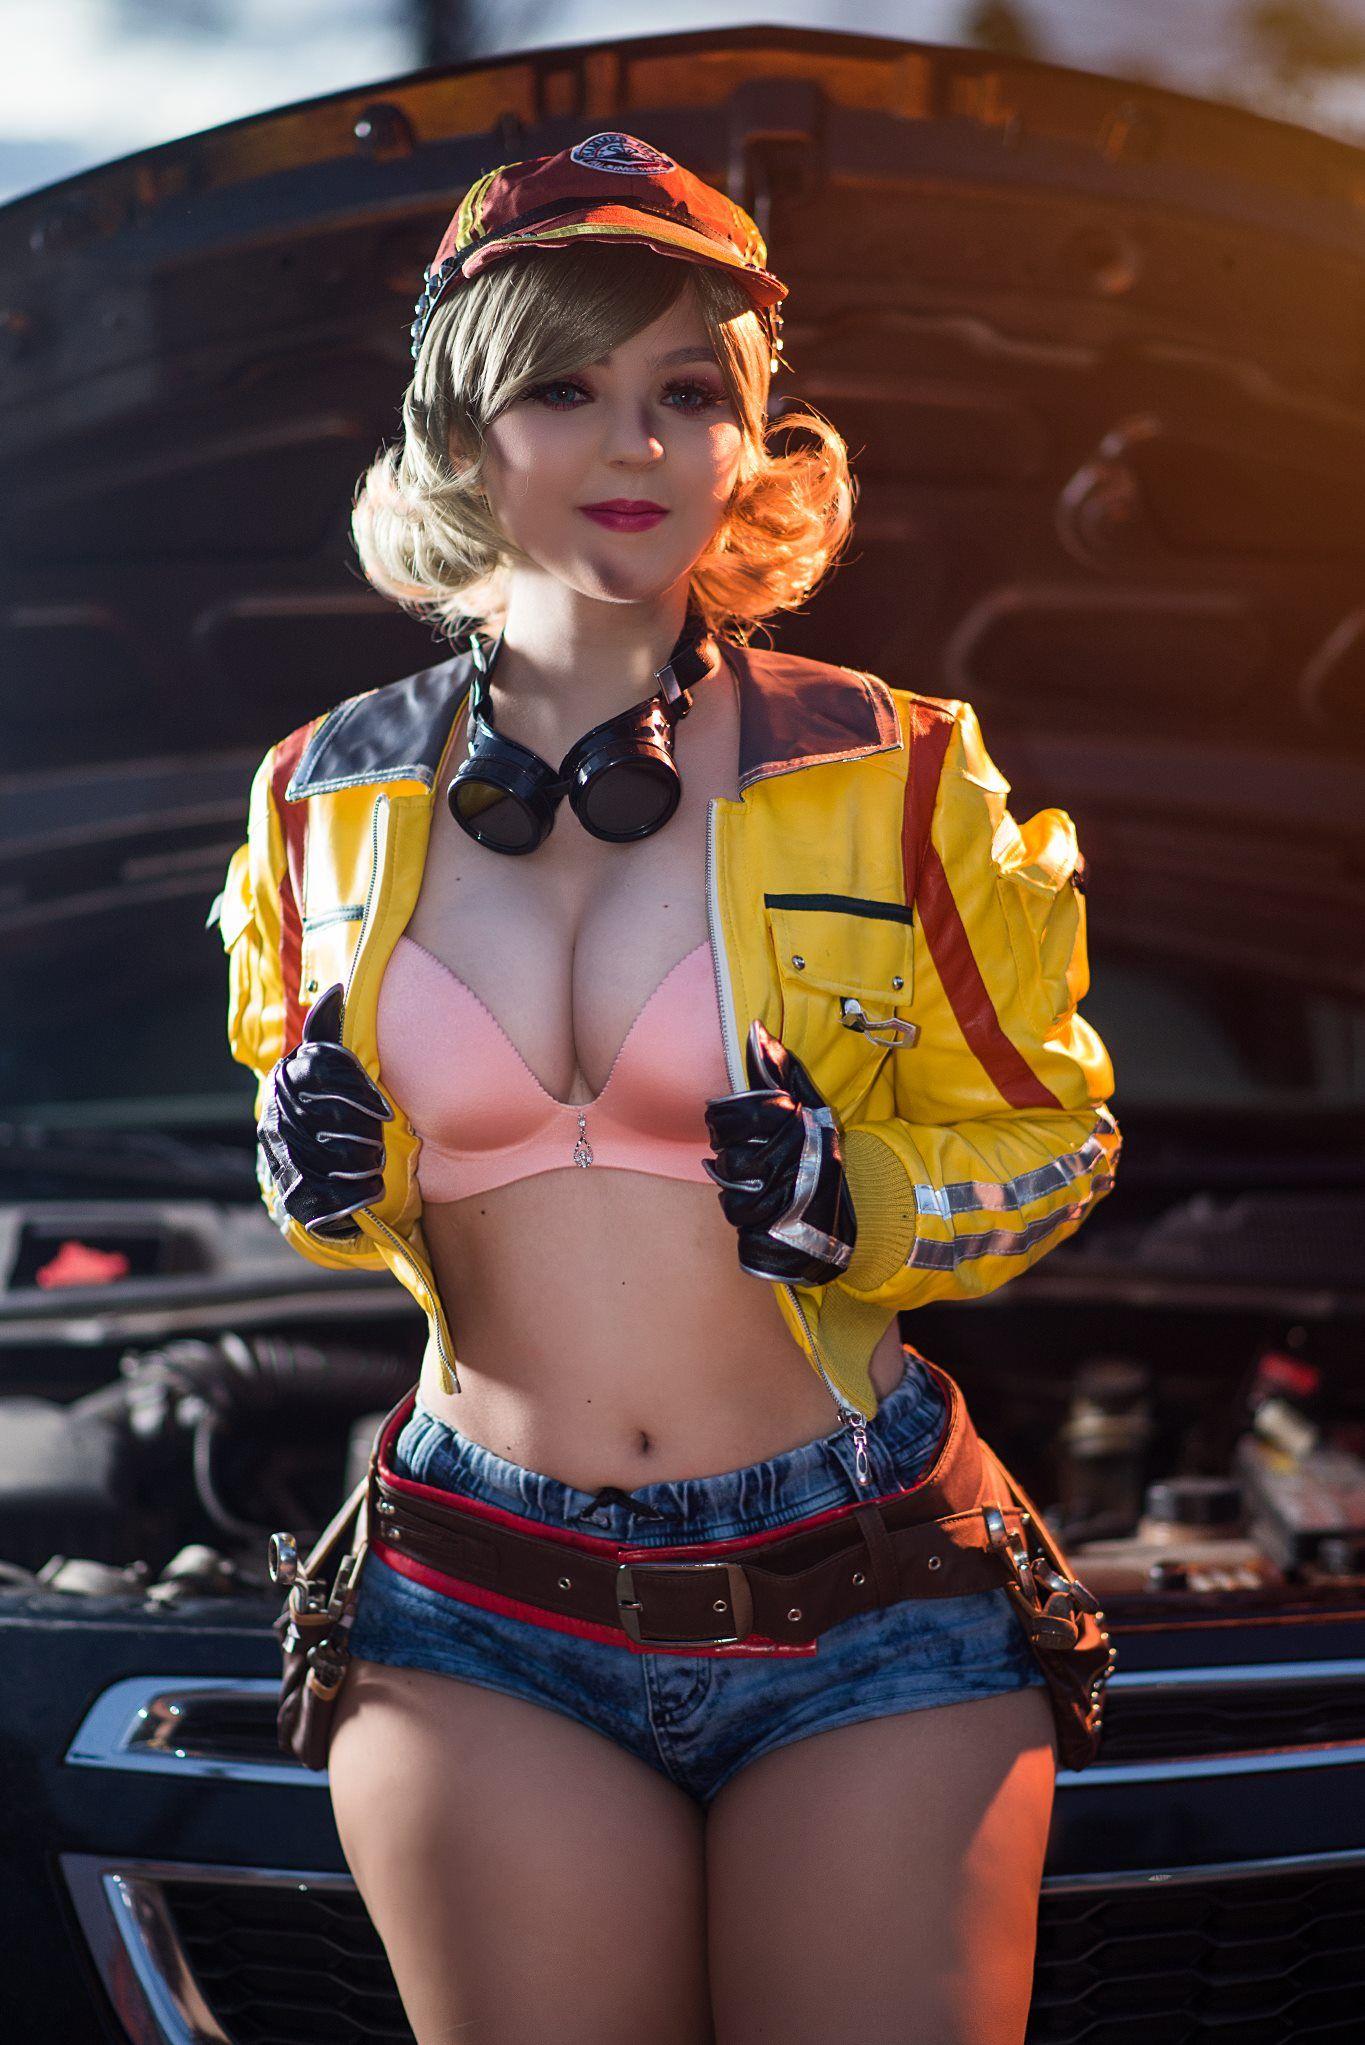 Pin on Cosplay, geek girls, steampunk and dieselpunk